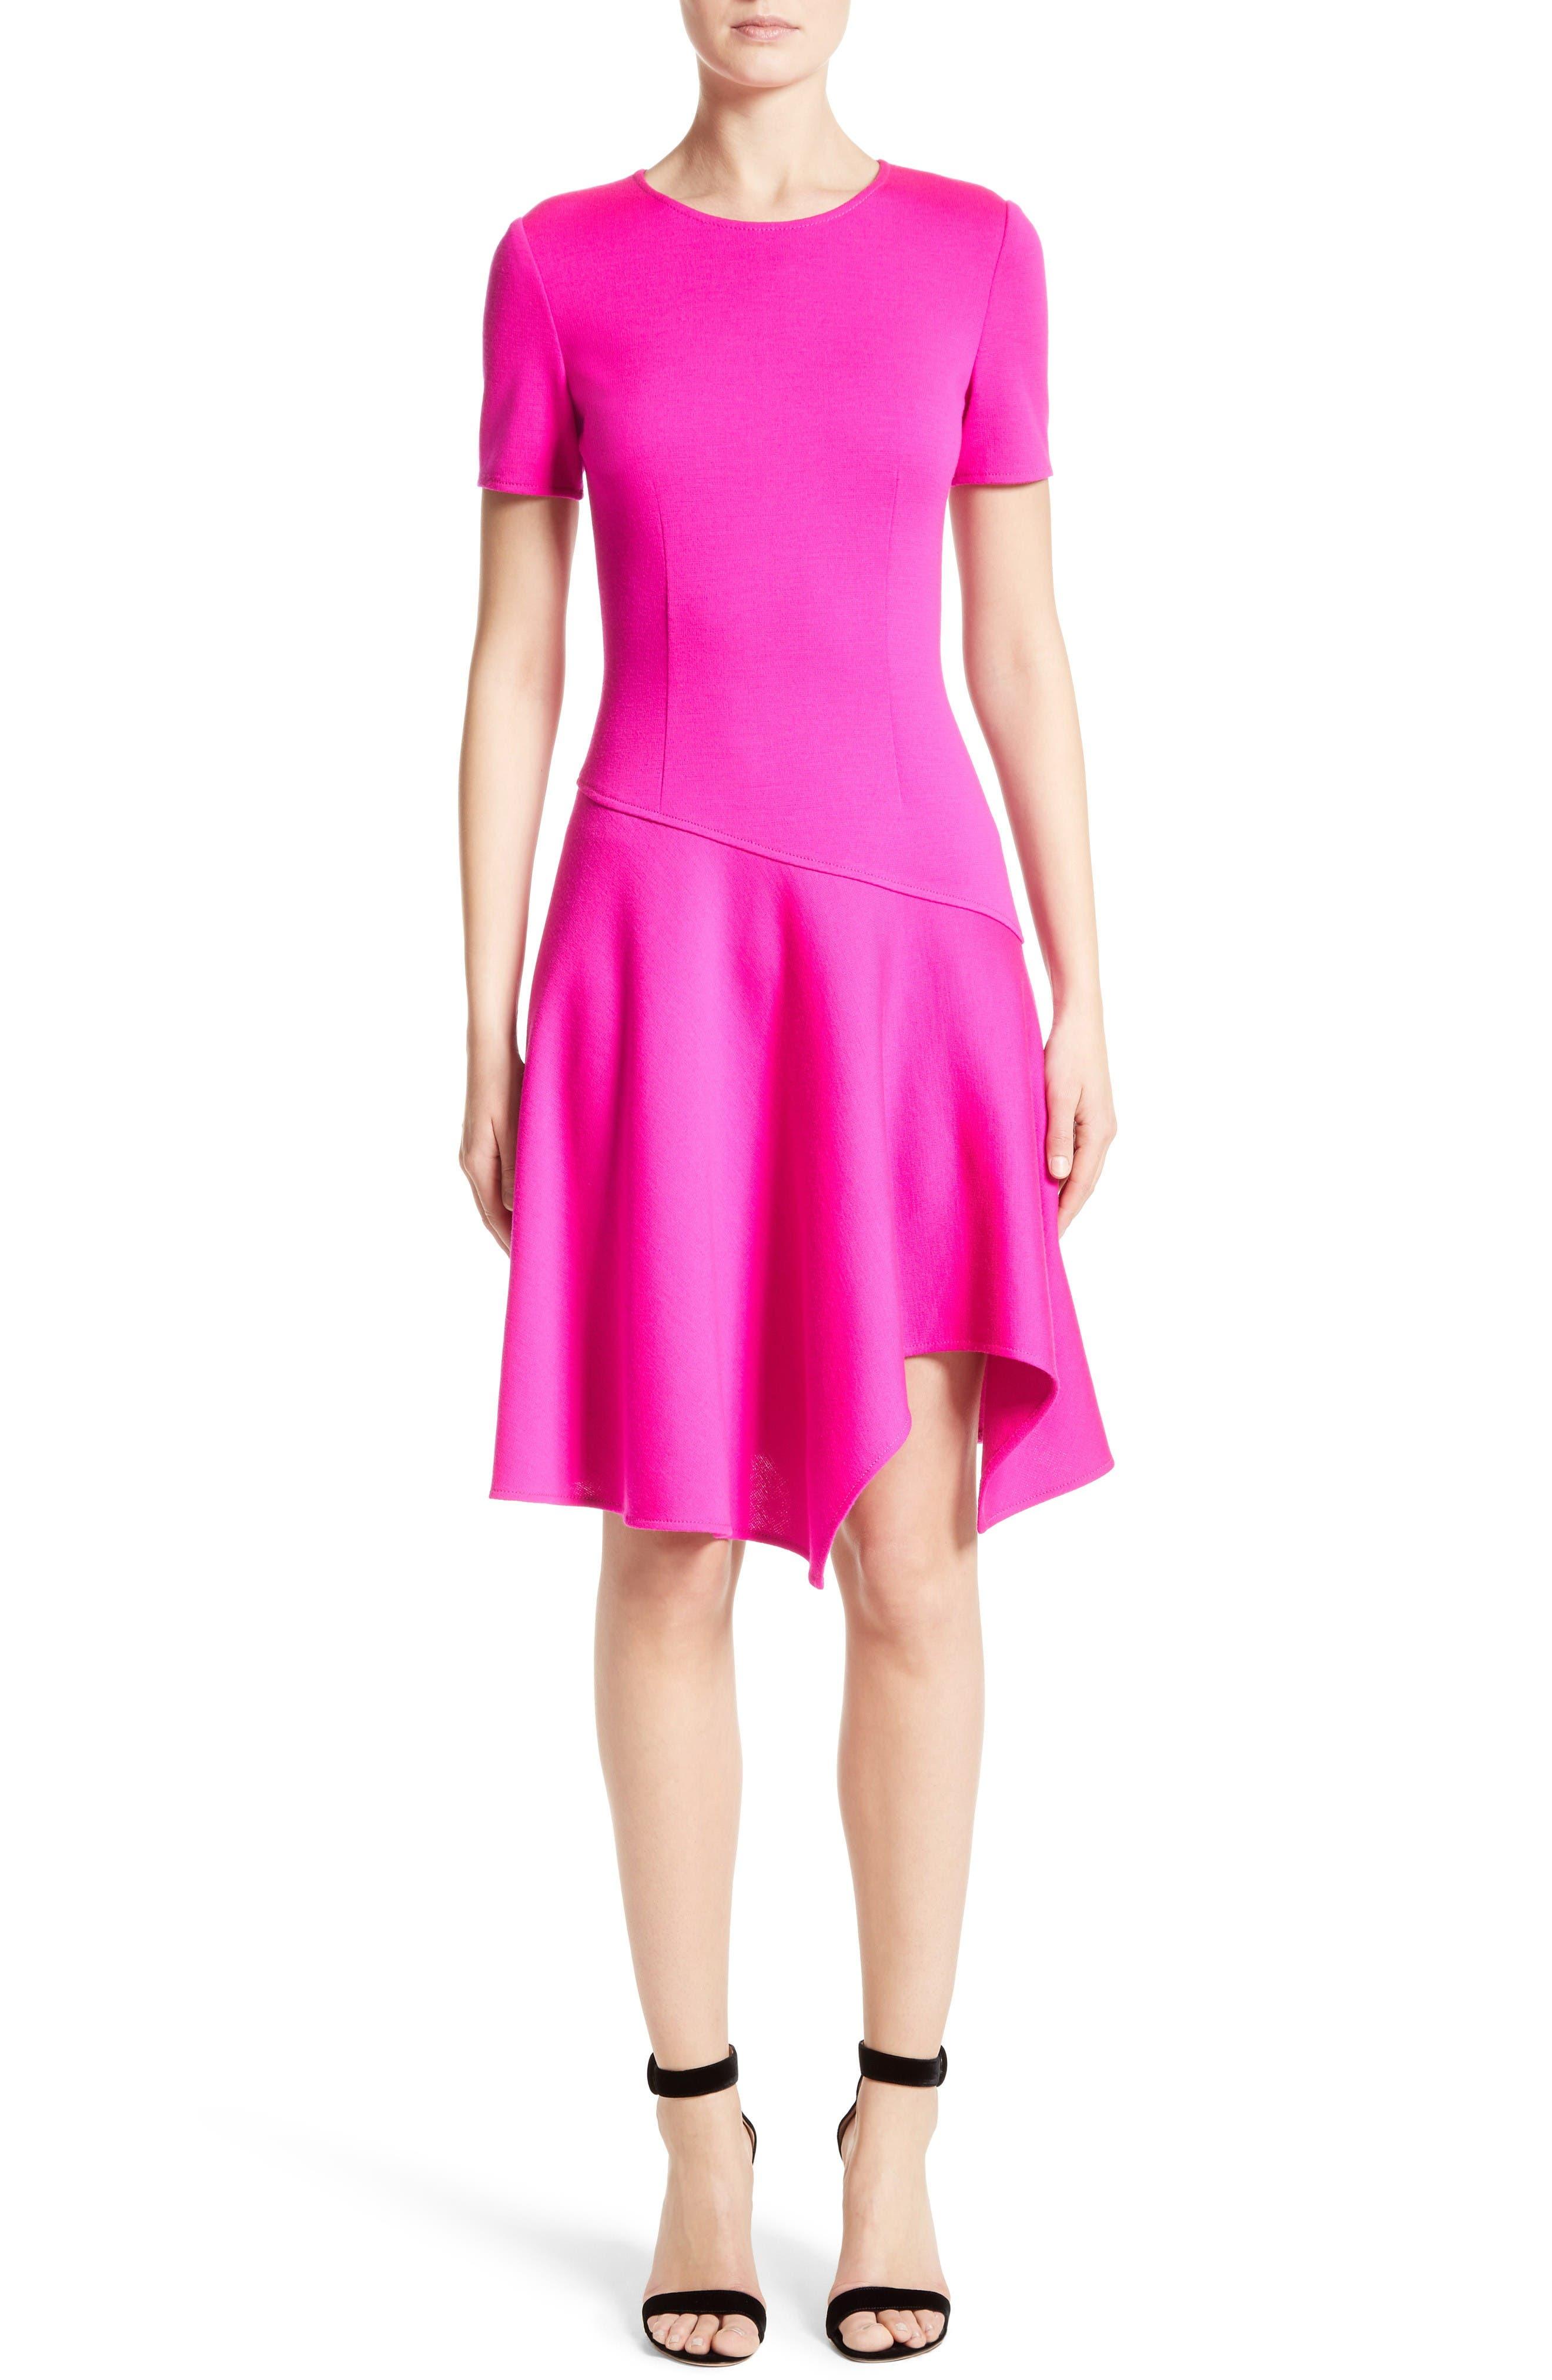 Main Image - St. John Collection Milano Knit Asymmetrical Dress